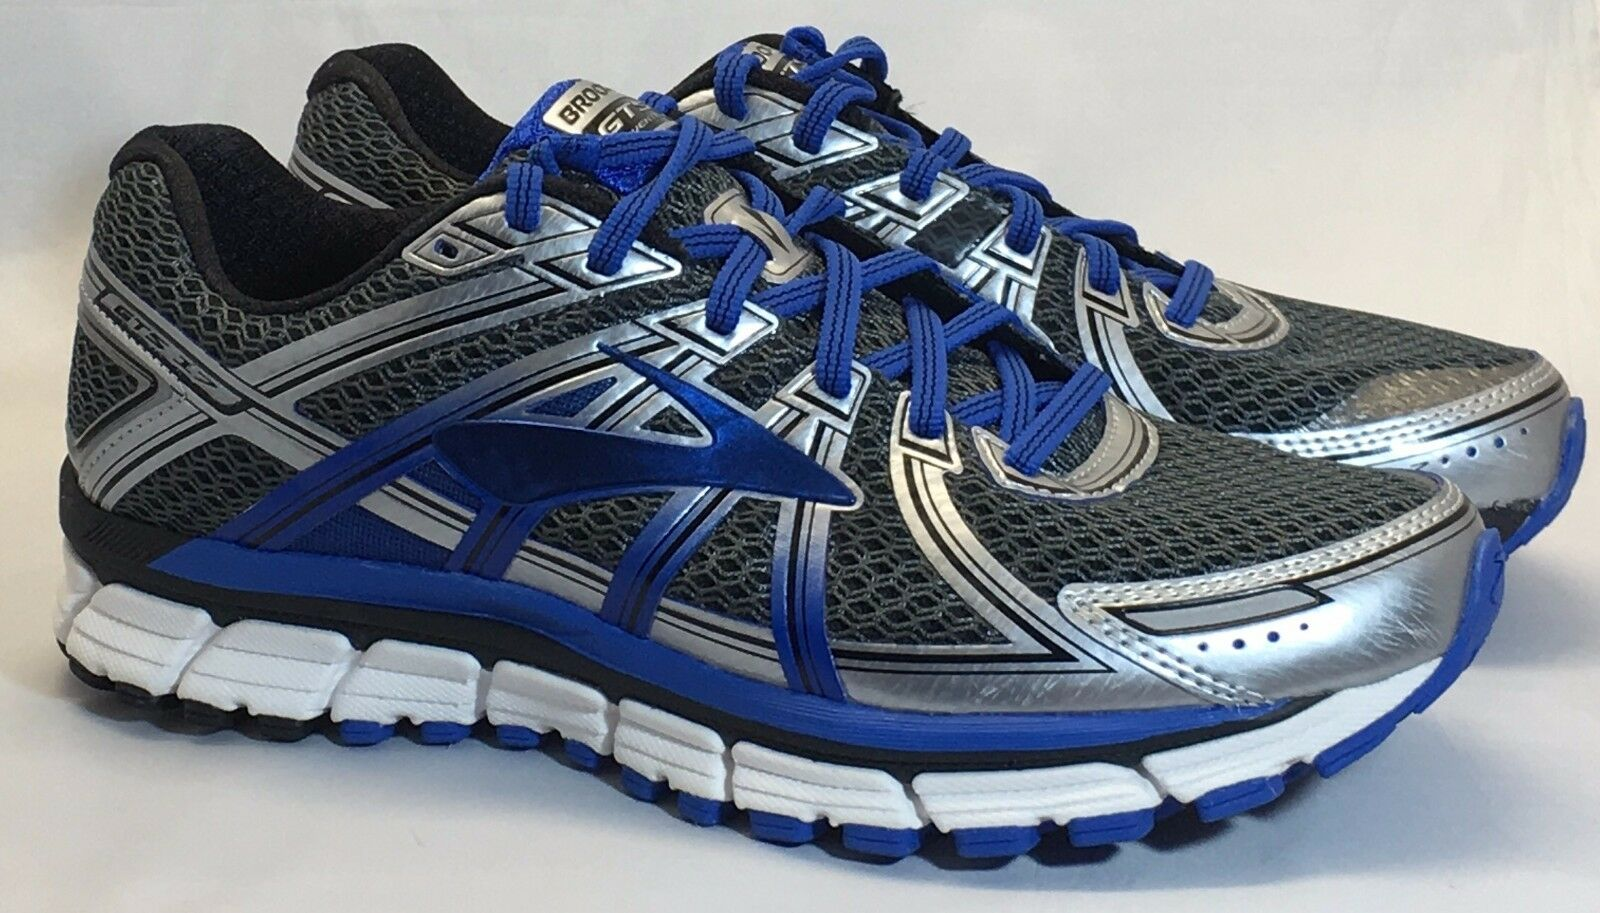 Free Aus Postage! Brooks Adrenaline GTS 17 Mens Running Runner Shoe (D) (017)